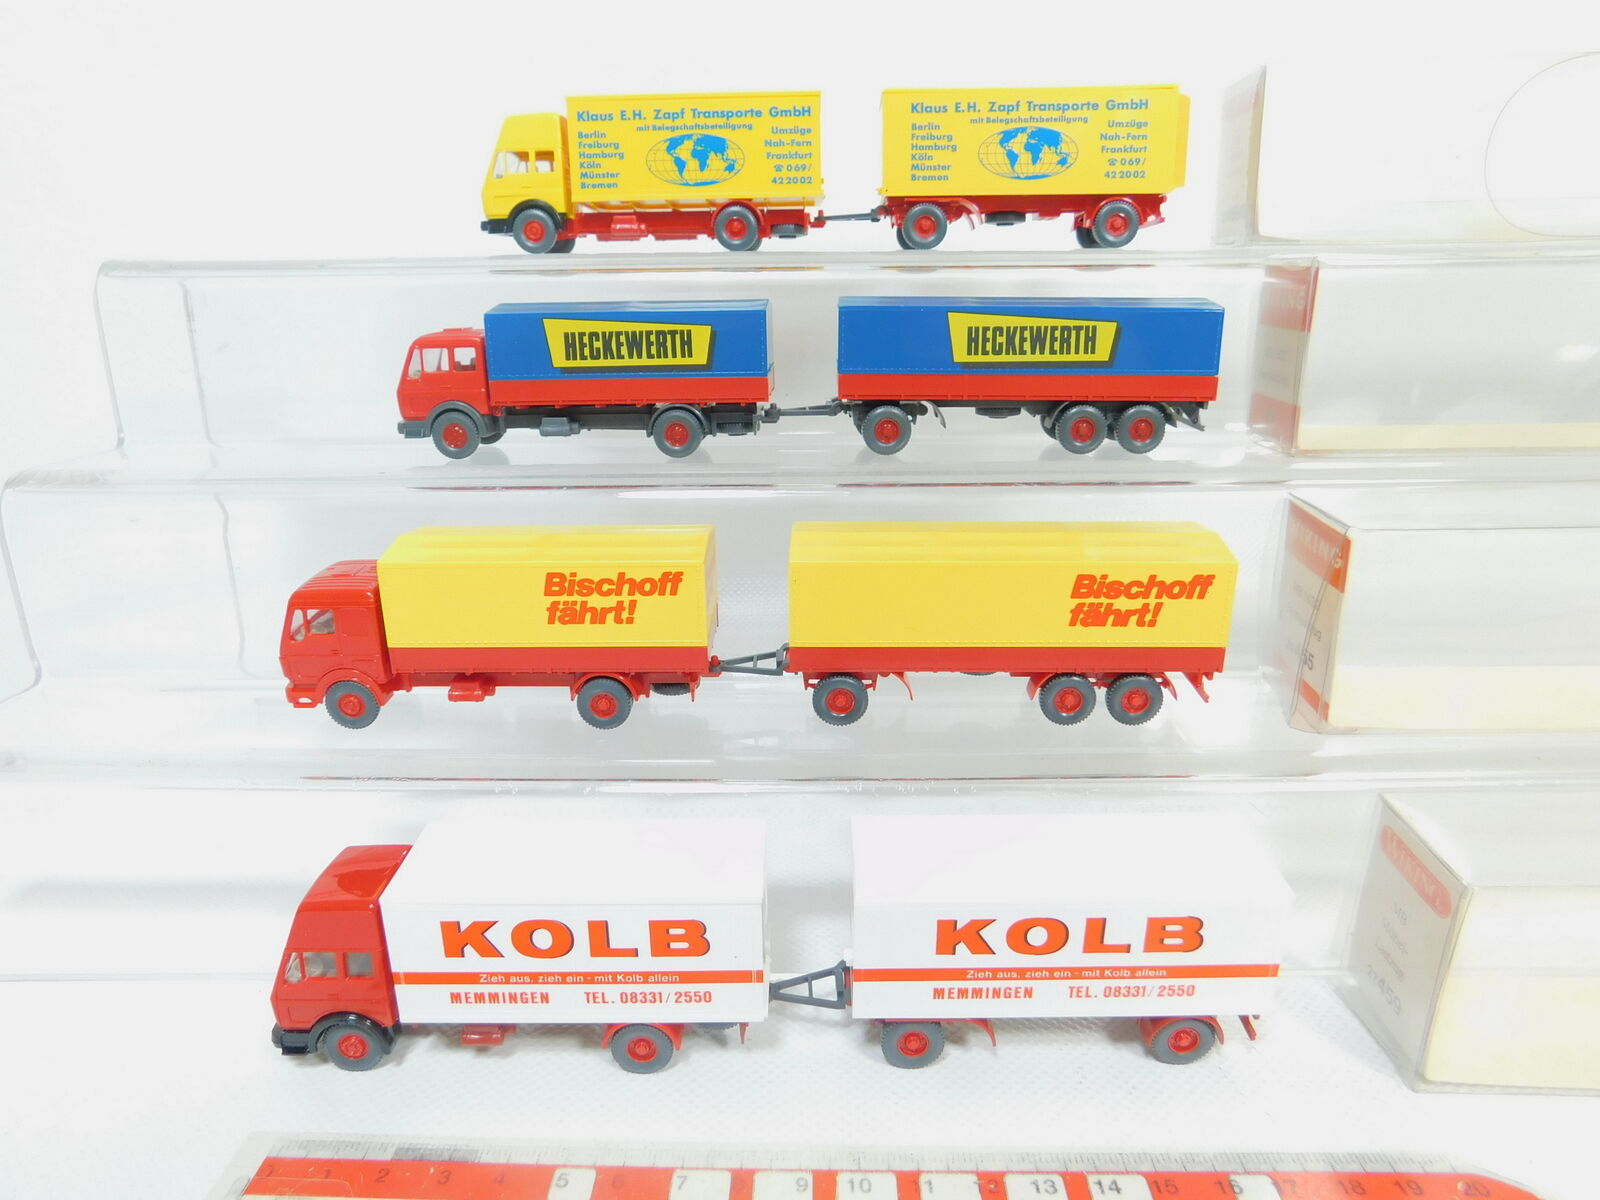 Bo747-0, 5  4x Wiking h0 1 87 poids MB  459 shérif Kolb 459 2 ZAPF 455, S.G.  neuf dans sa boîte